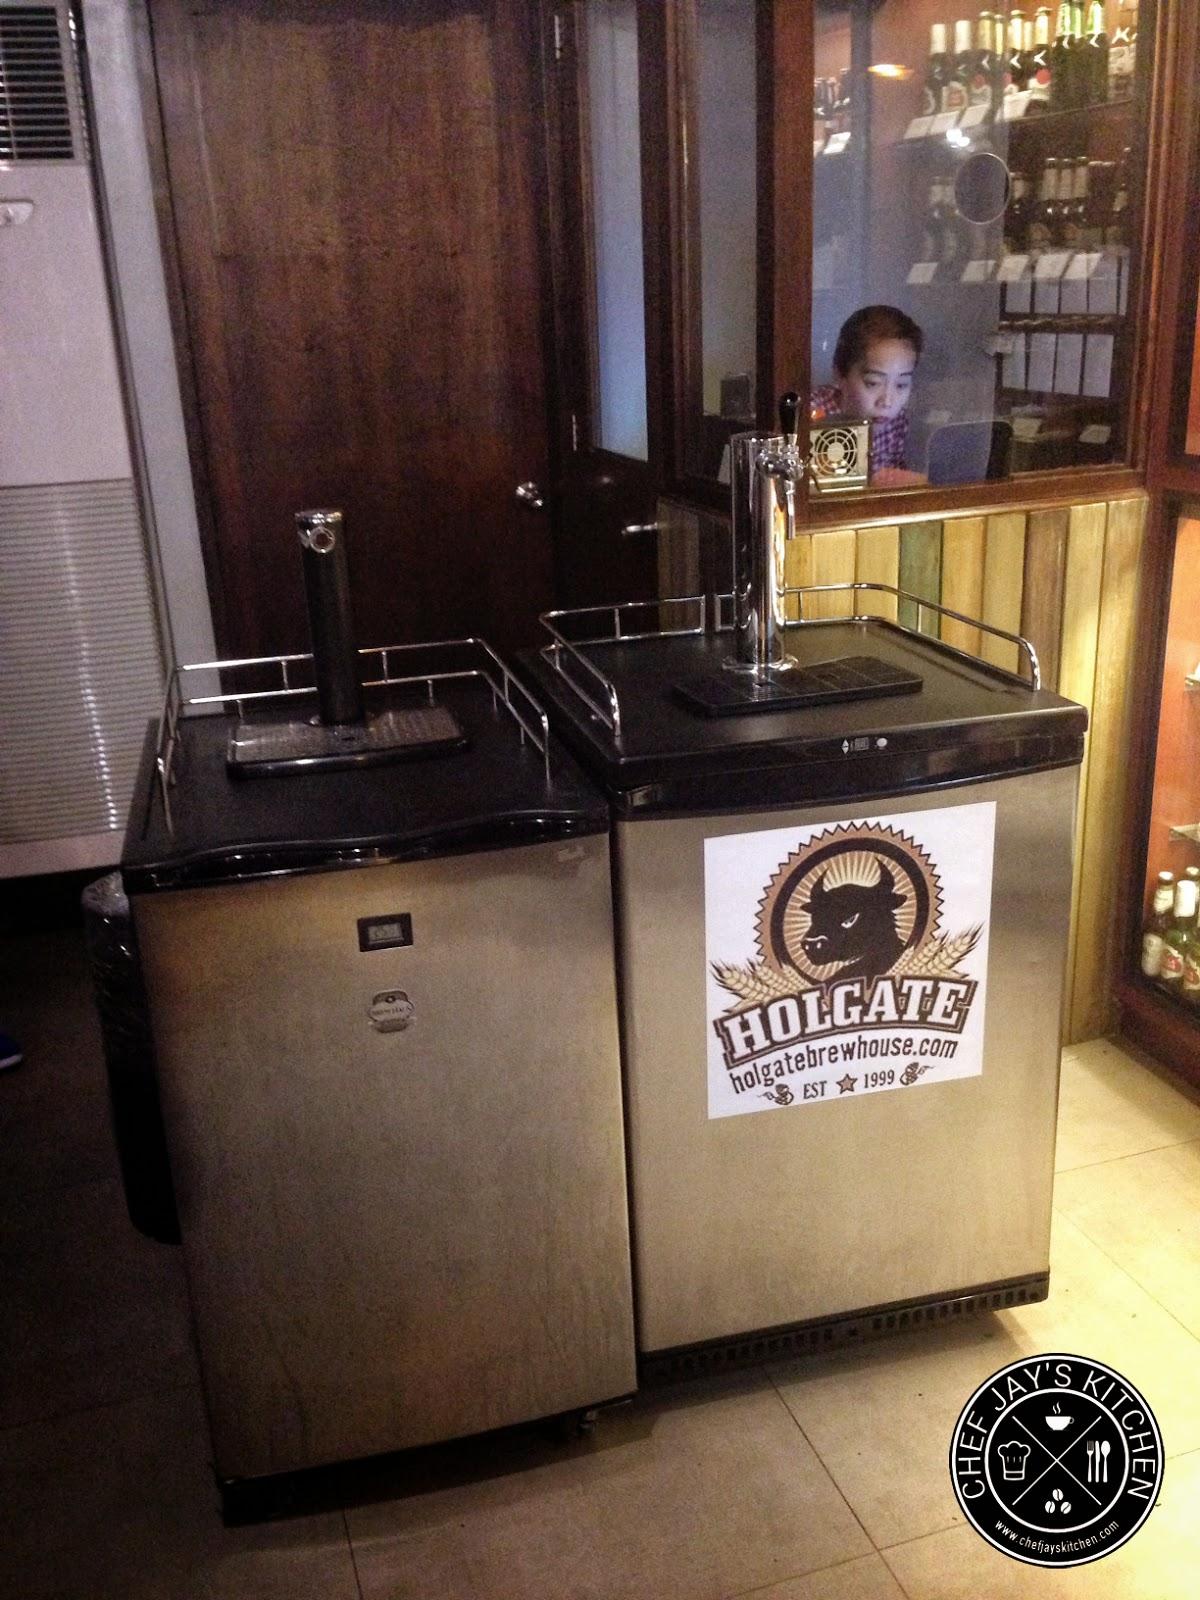 Brewery Gastropub Iloilo City Craft Coffee Holgate Brew